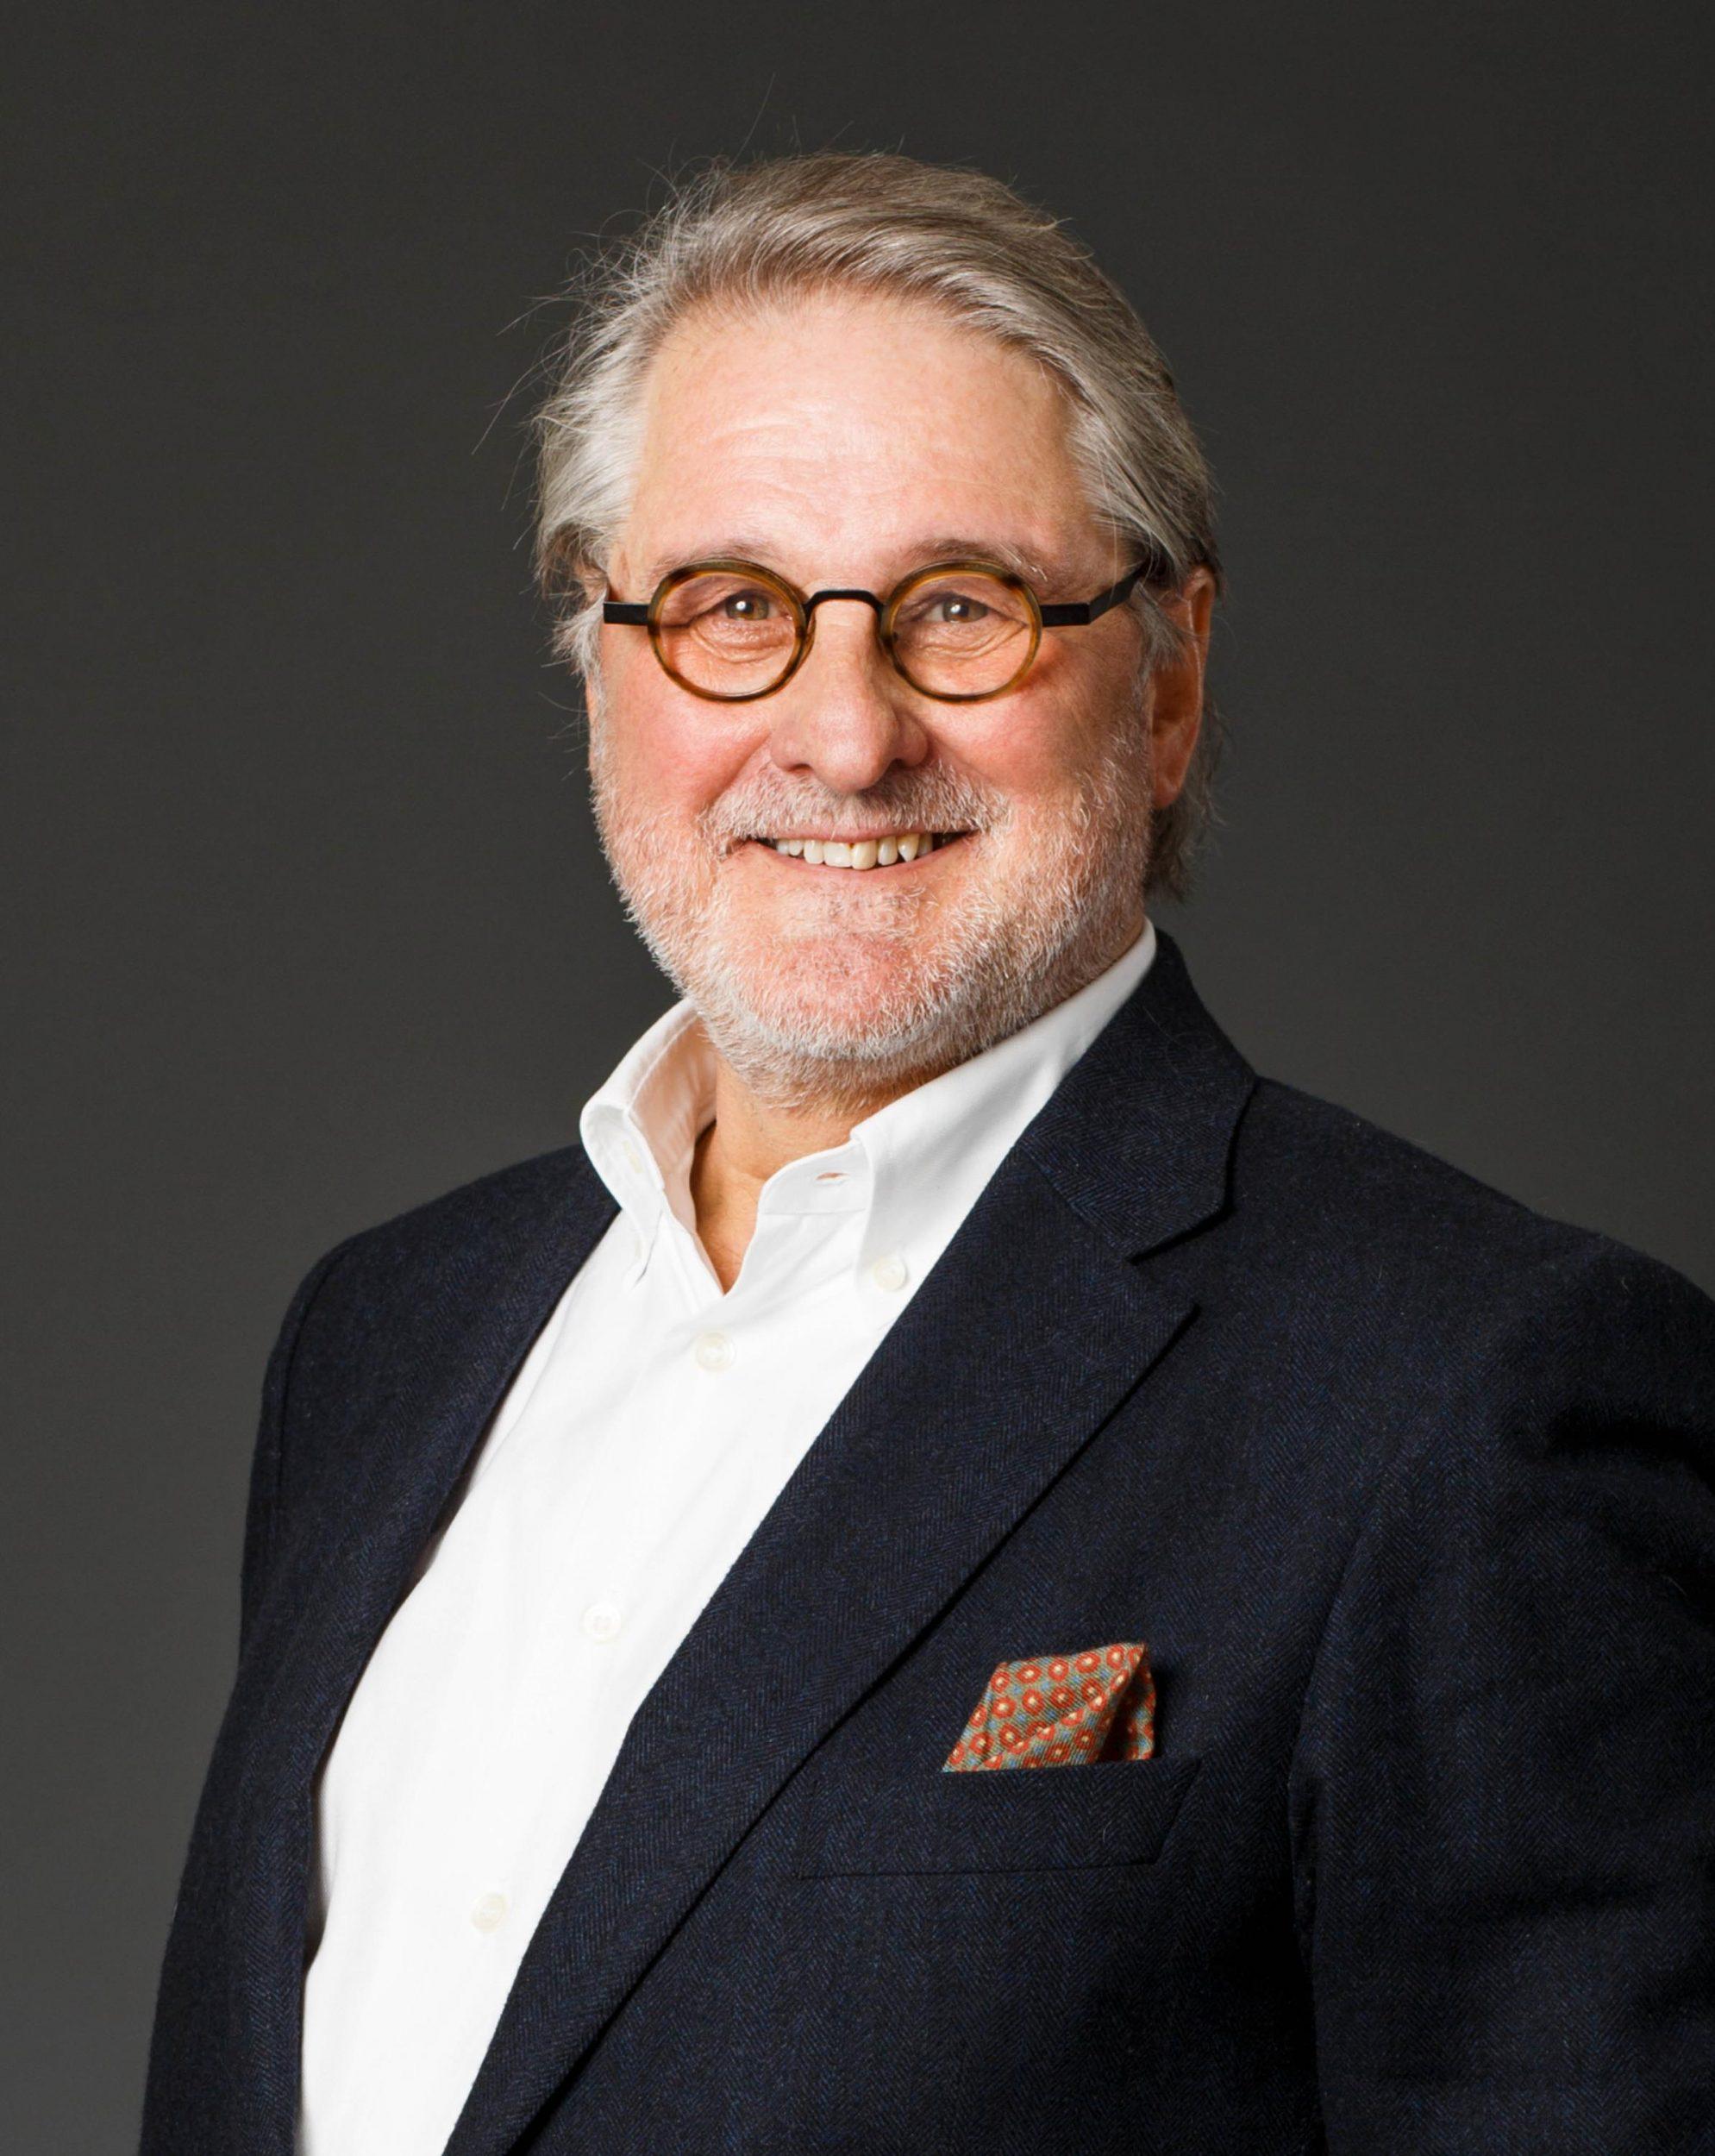 Thomas Lagerqvist